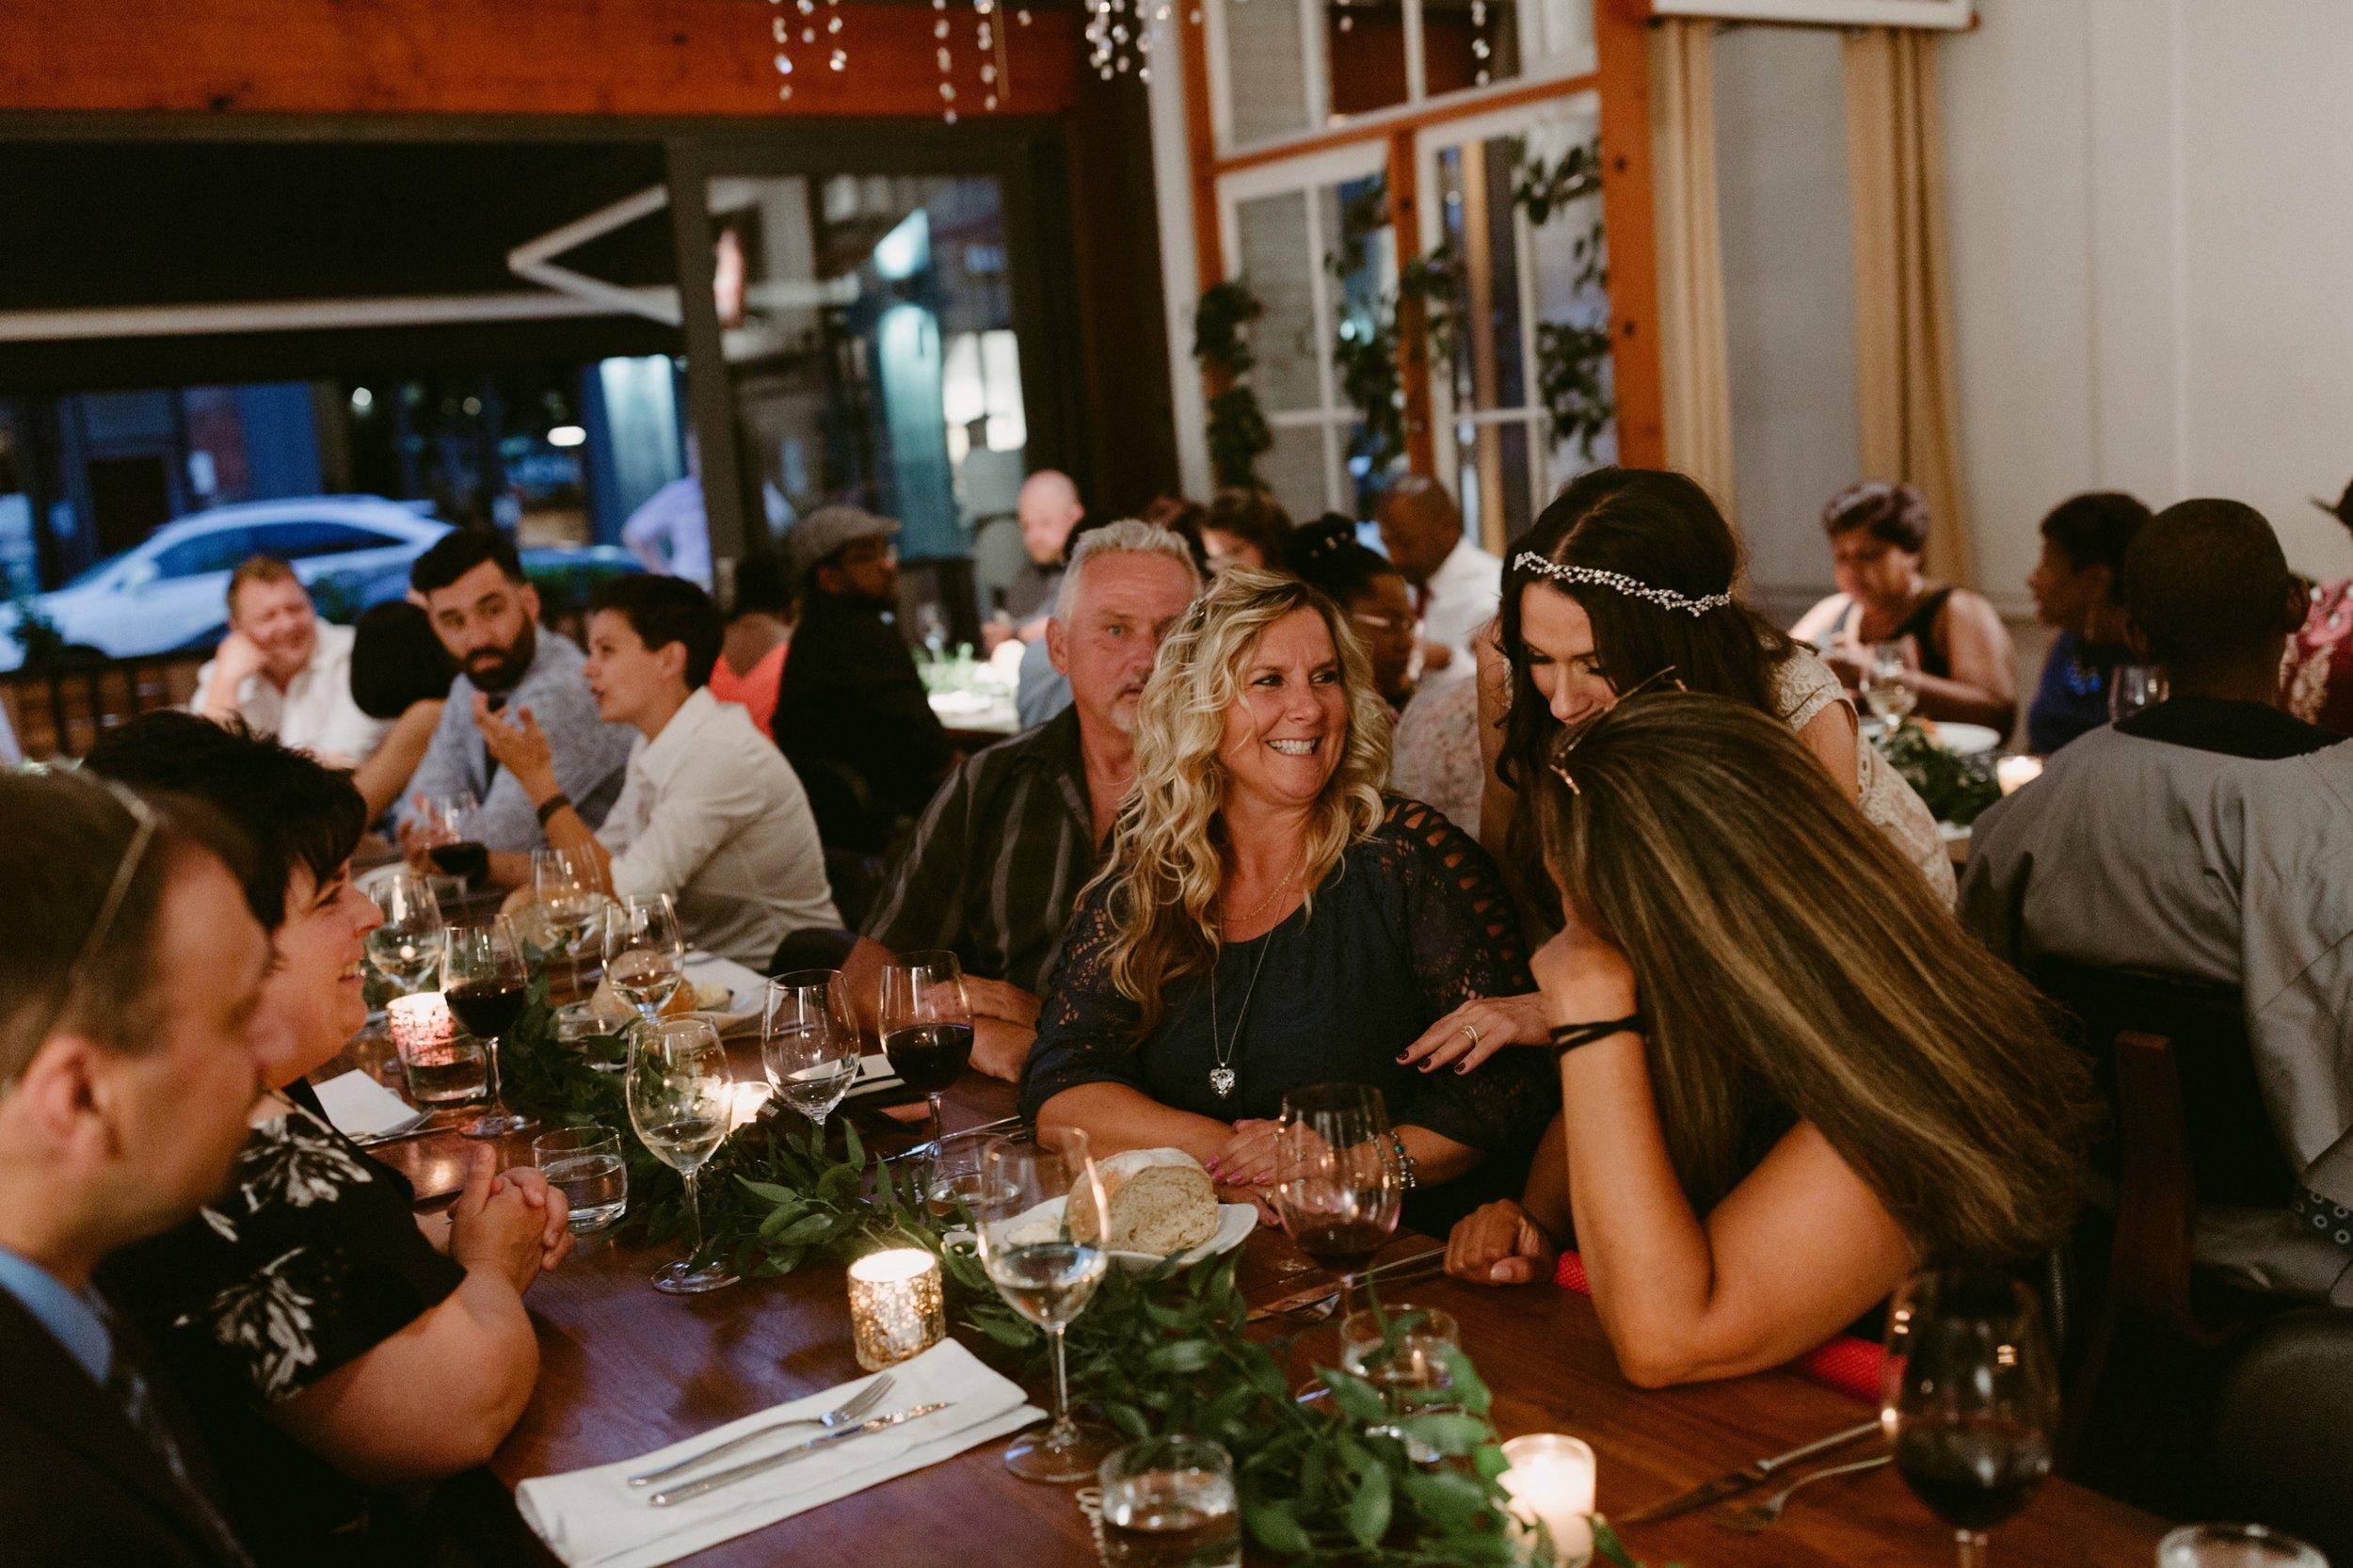 083_Spadina House Wedding (534 of 748)_intimate_Boehmer_Restaurant_Toronto_Wedding.jpg